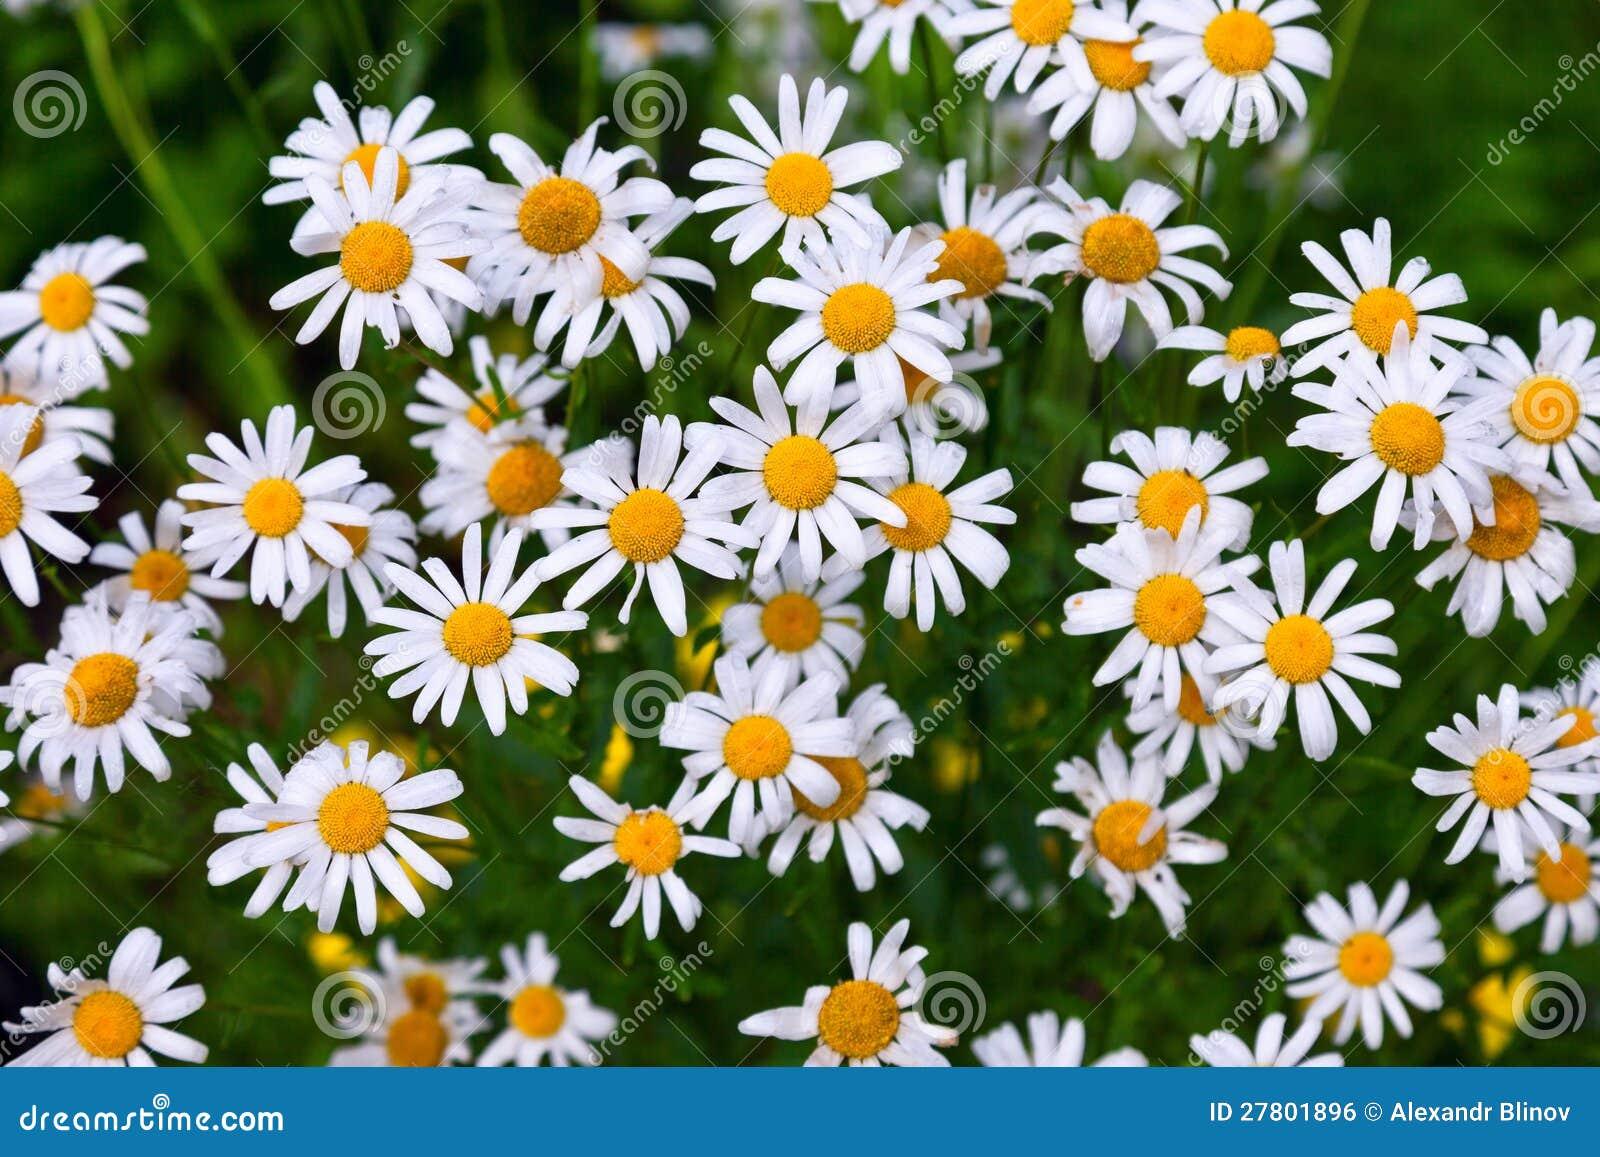 White Daisy Family Herbal Flowers Stock Photo Image Of Green